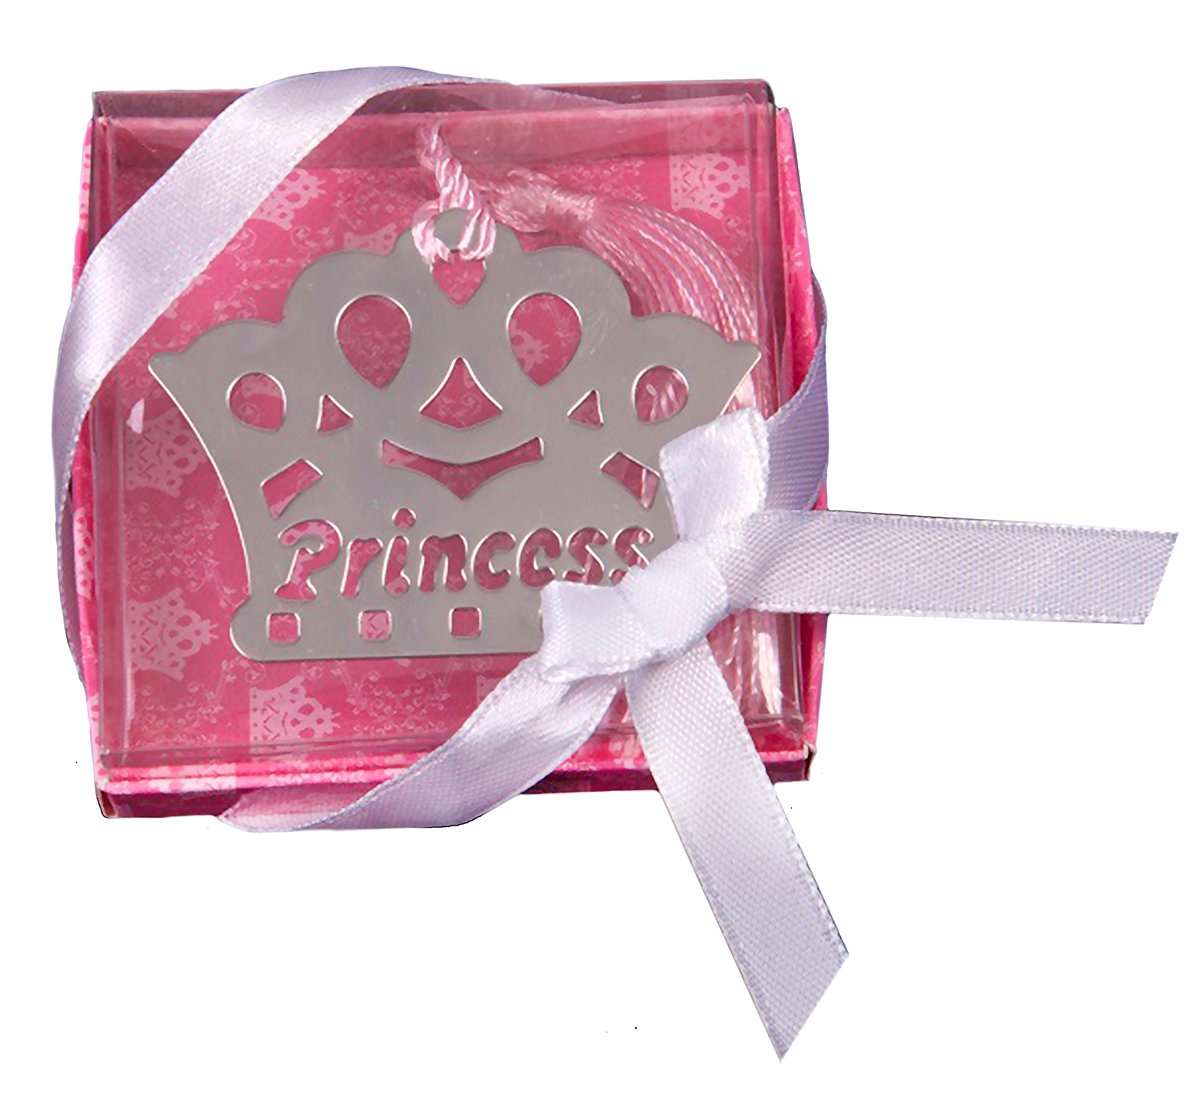 Magic Home Закладка для книг Корона magic home закладка для книг корона принц